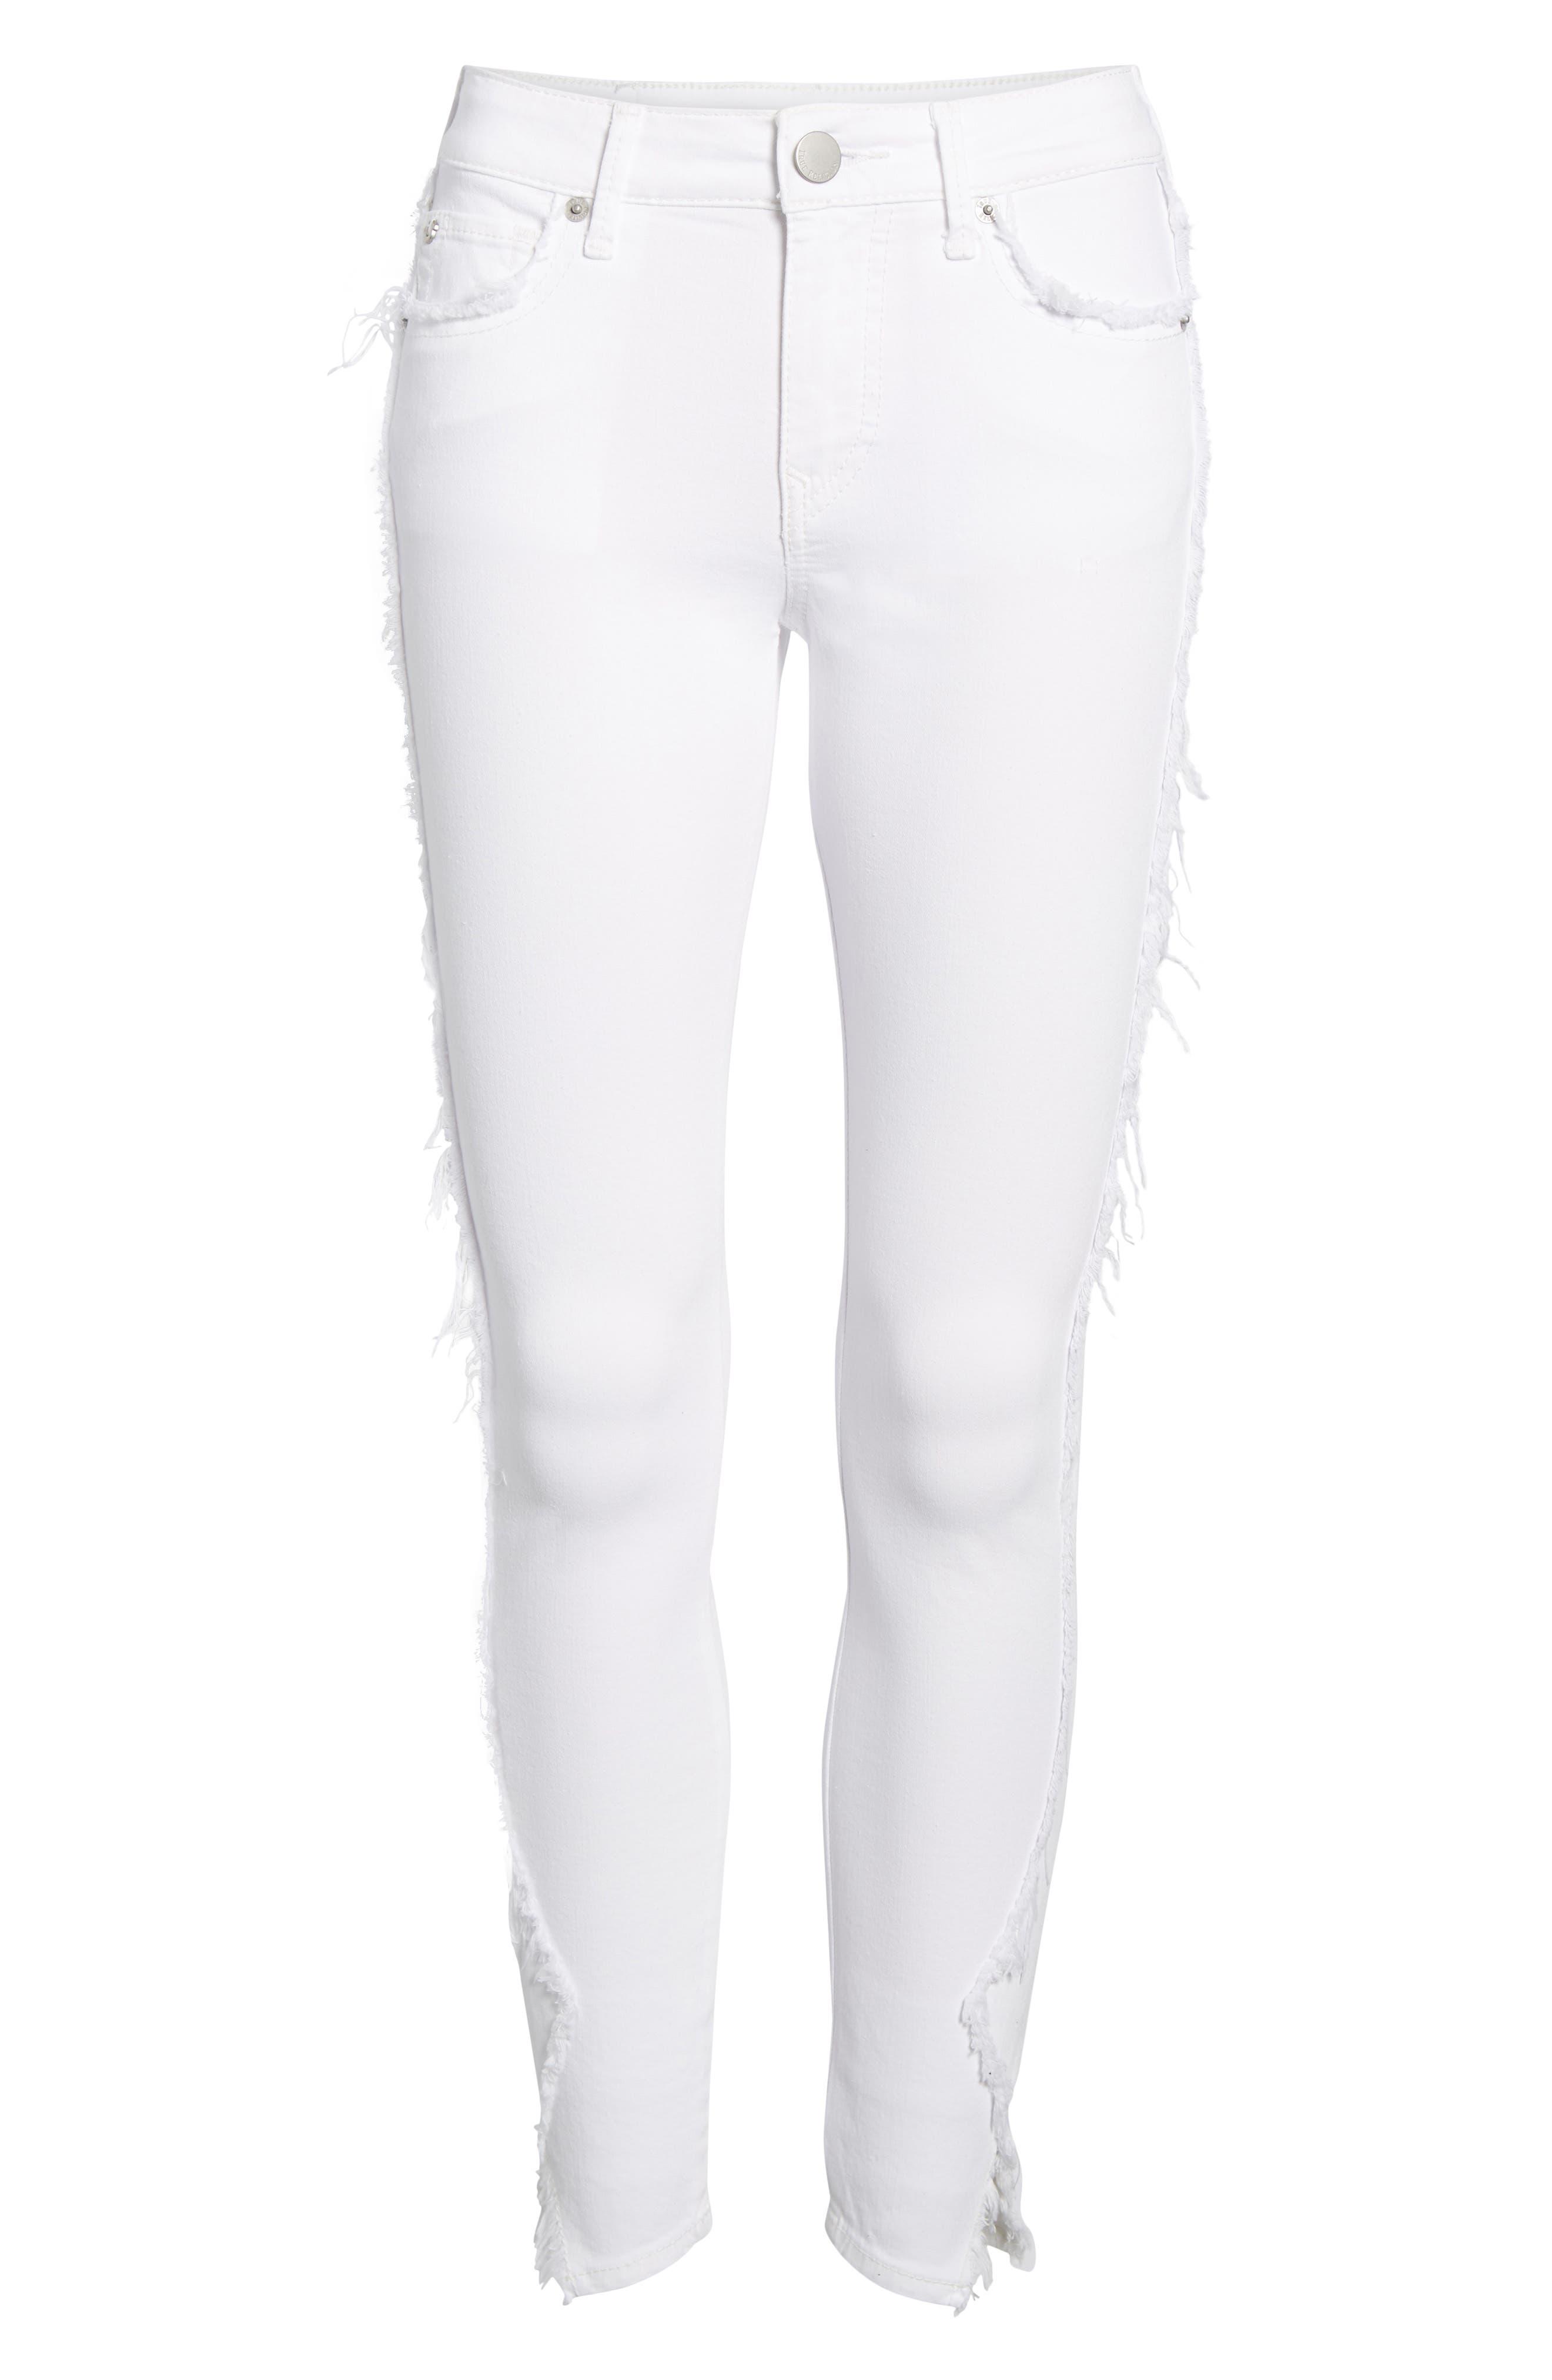 Jennie Curvy Skinny Jeans,                             Alternate thumbnail 7, color,                             Optic White